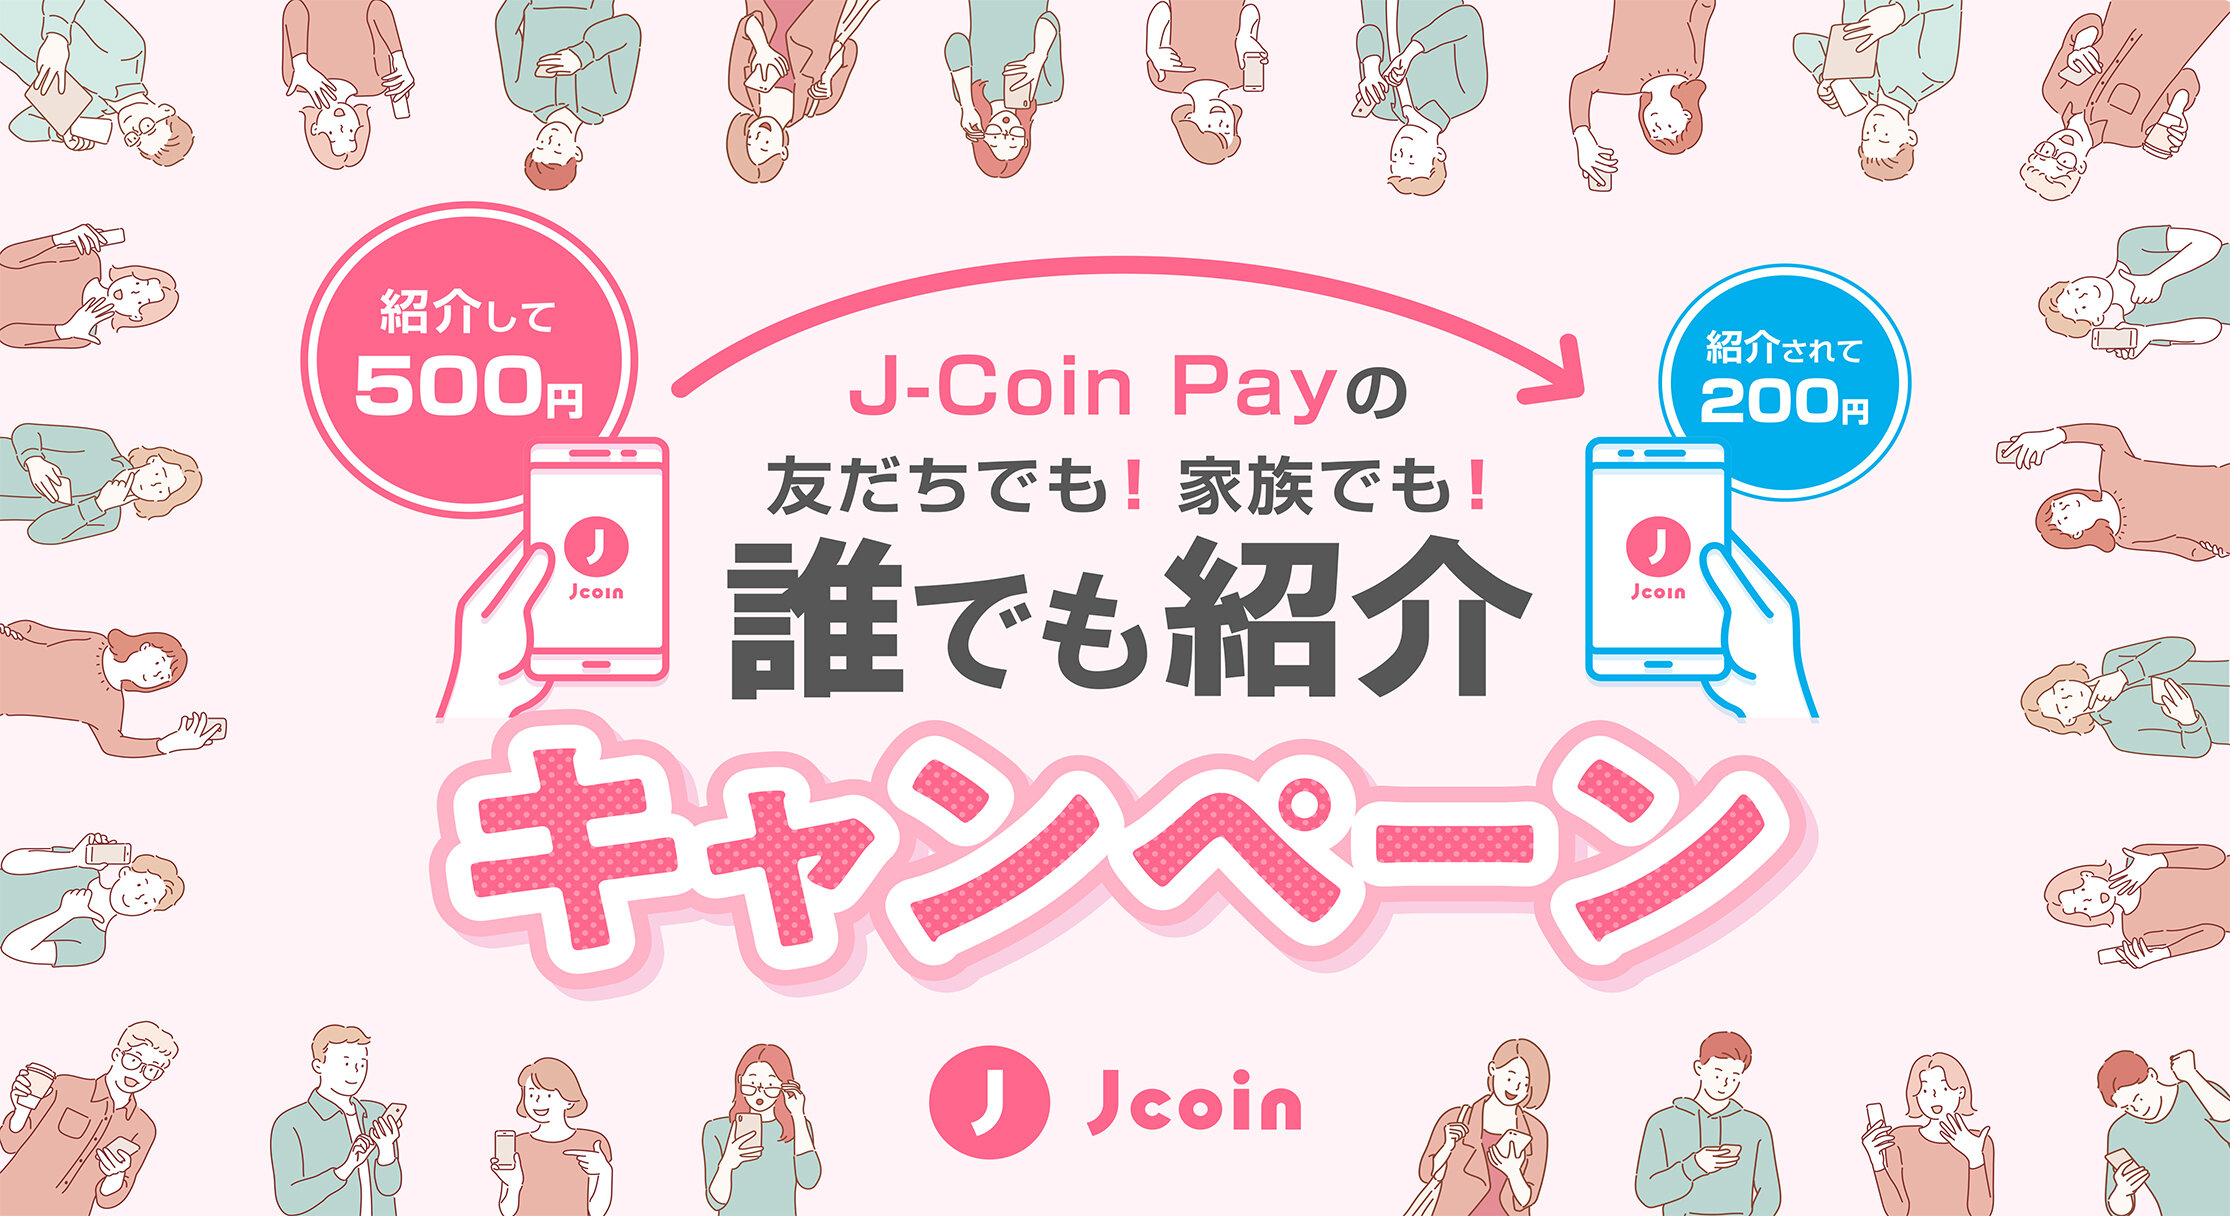 J-Coin Payで紹介して500円、紹介されて200円がもれなく貰える。しょうがない、遊んであげよう。~8/20。